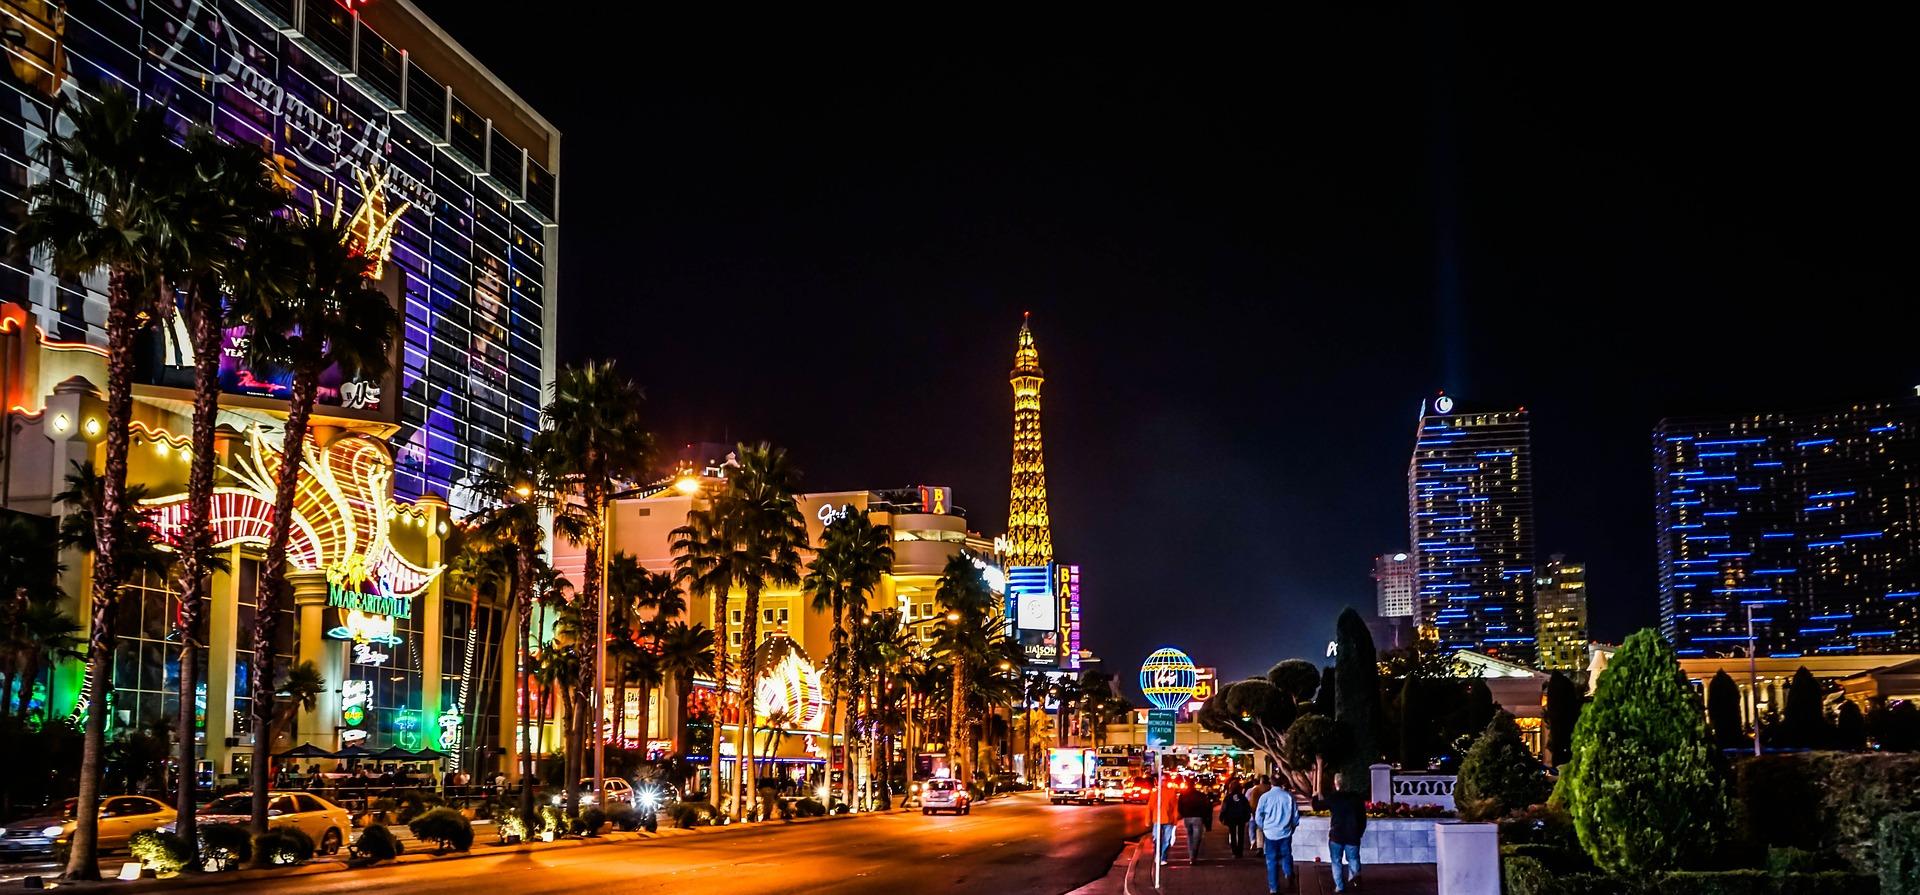 At night in Las Vegas, Nevada